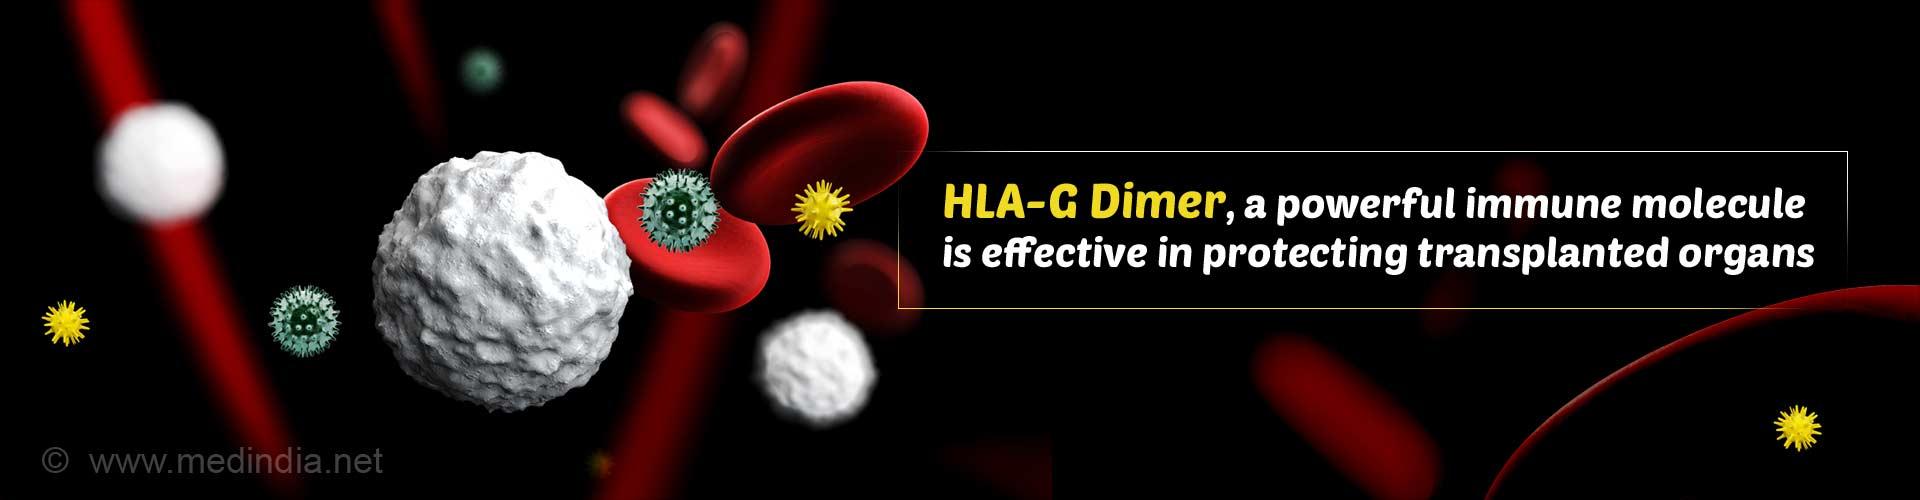 Powerful Immune Molecule Protects Transplanted Organs